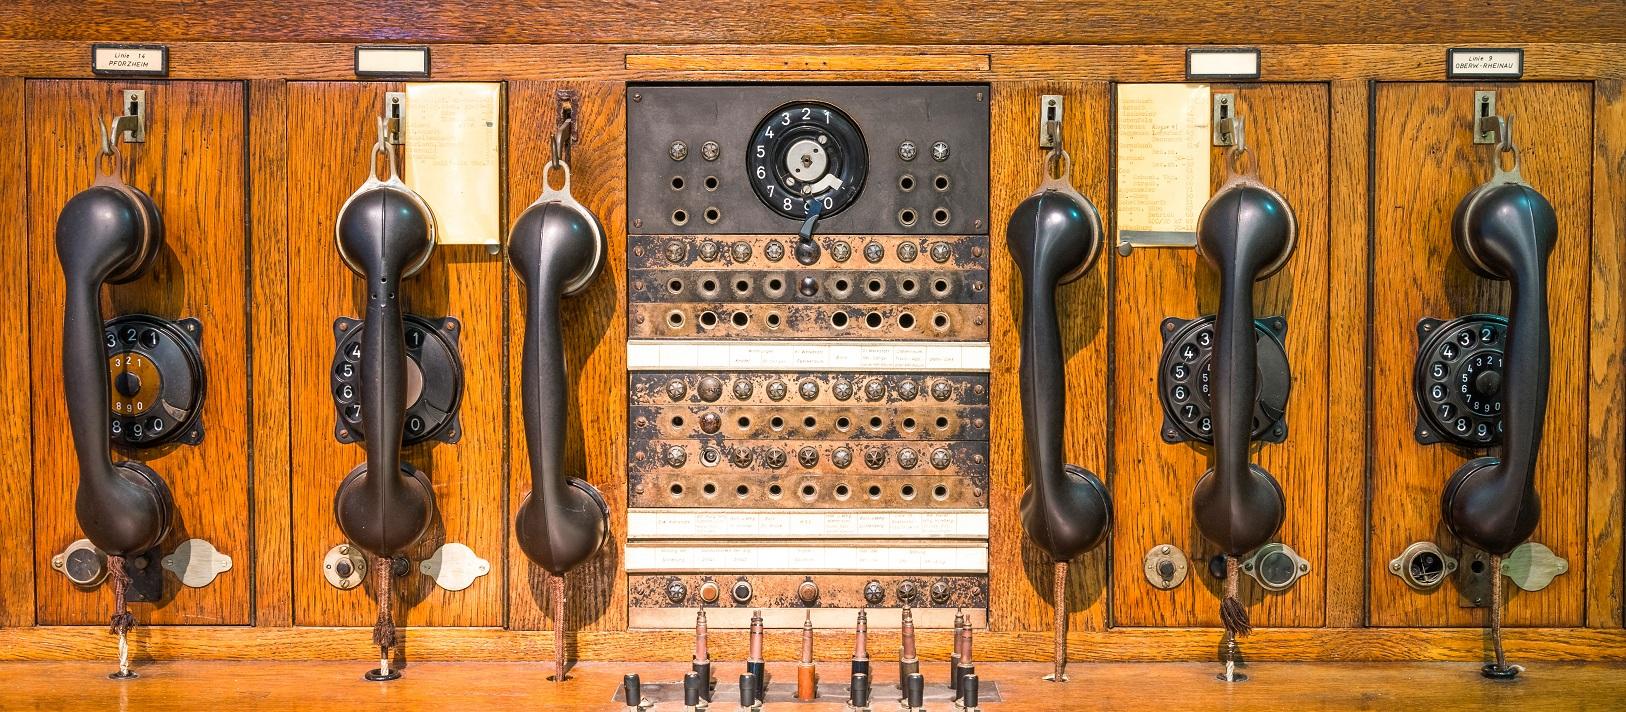 servzi di telecomunicazione